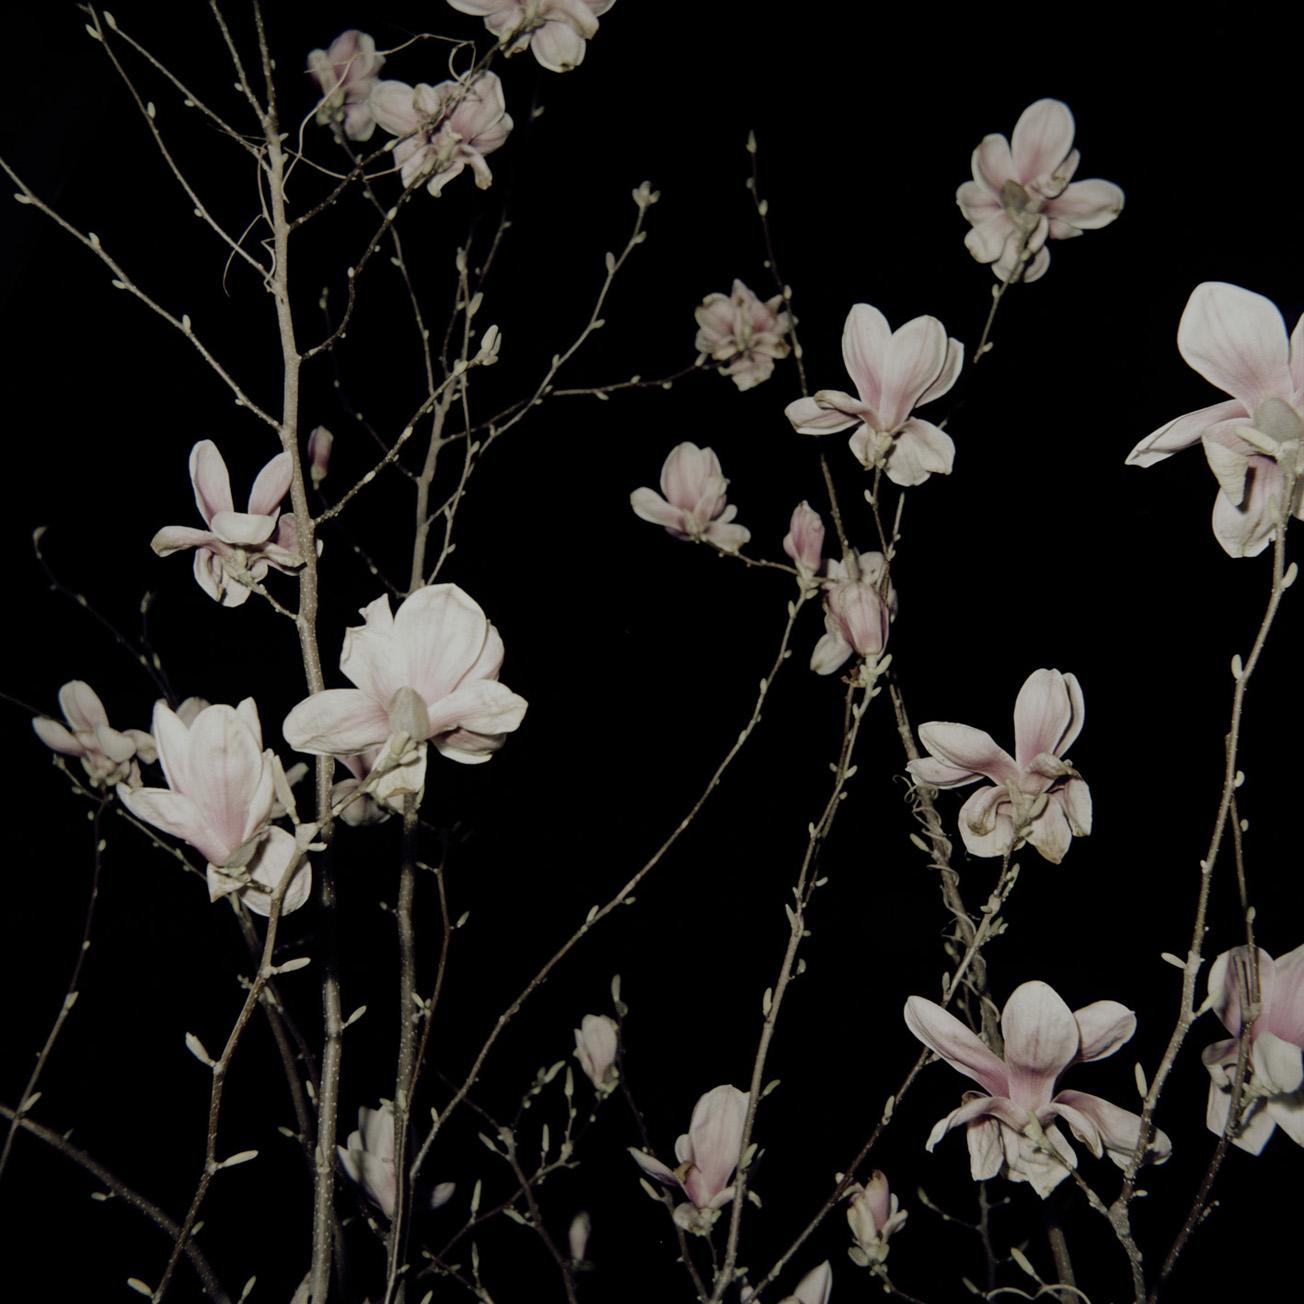 Lena Grass | magnolien